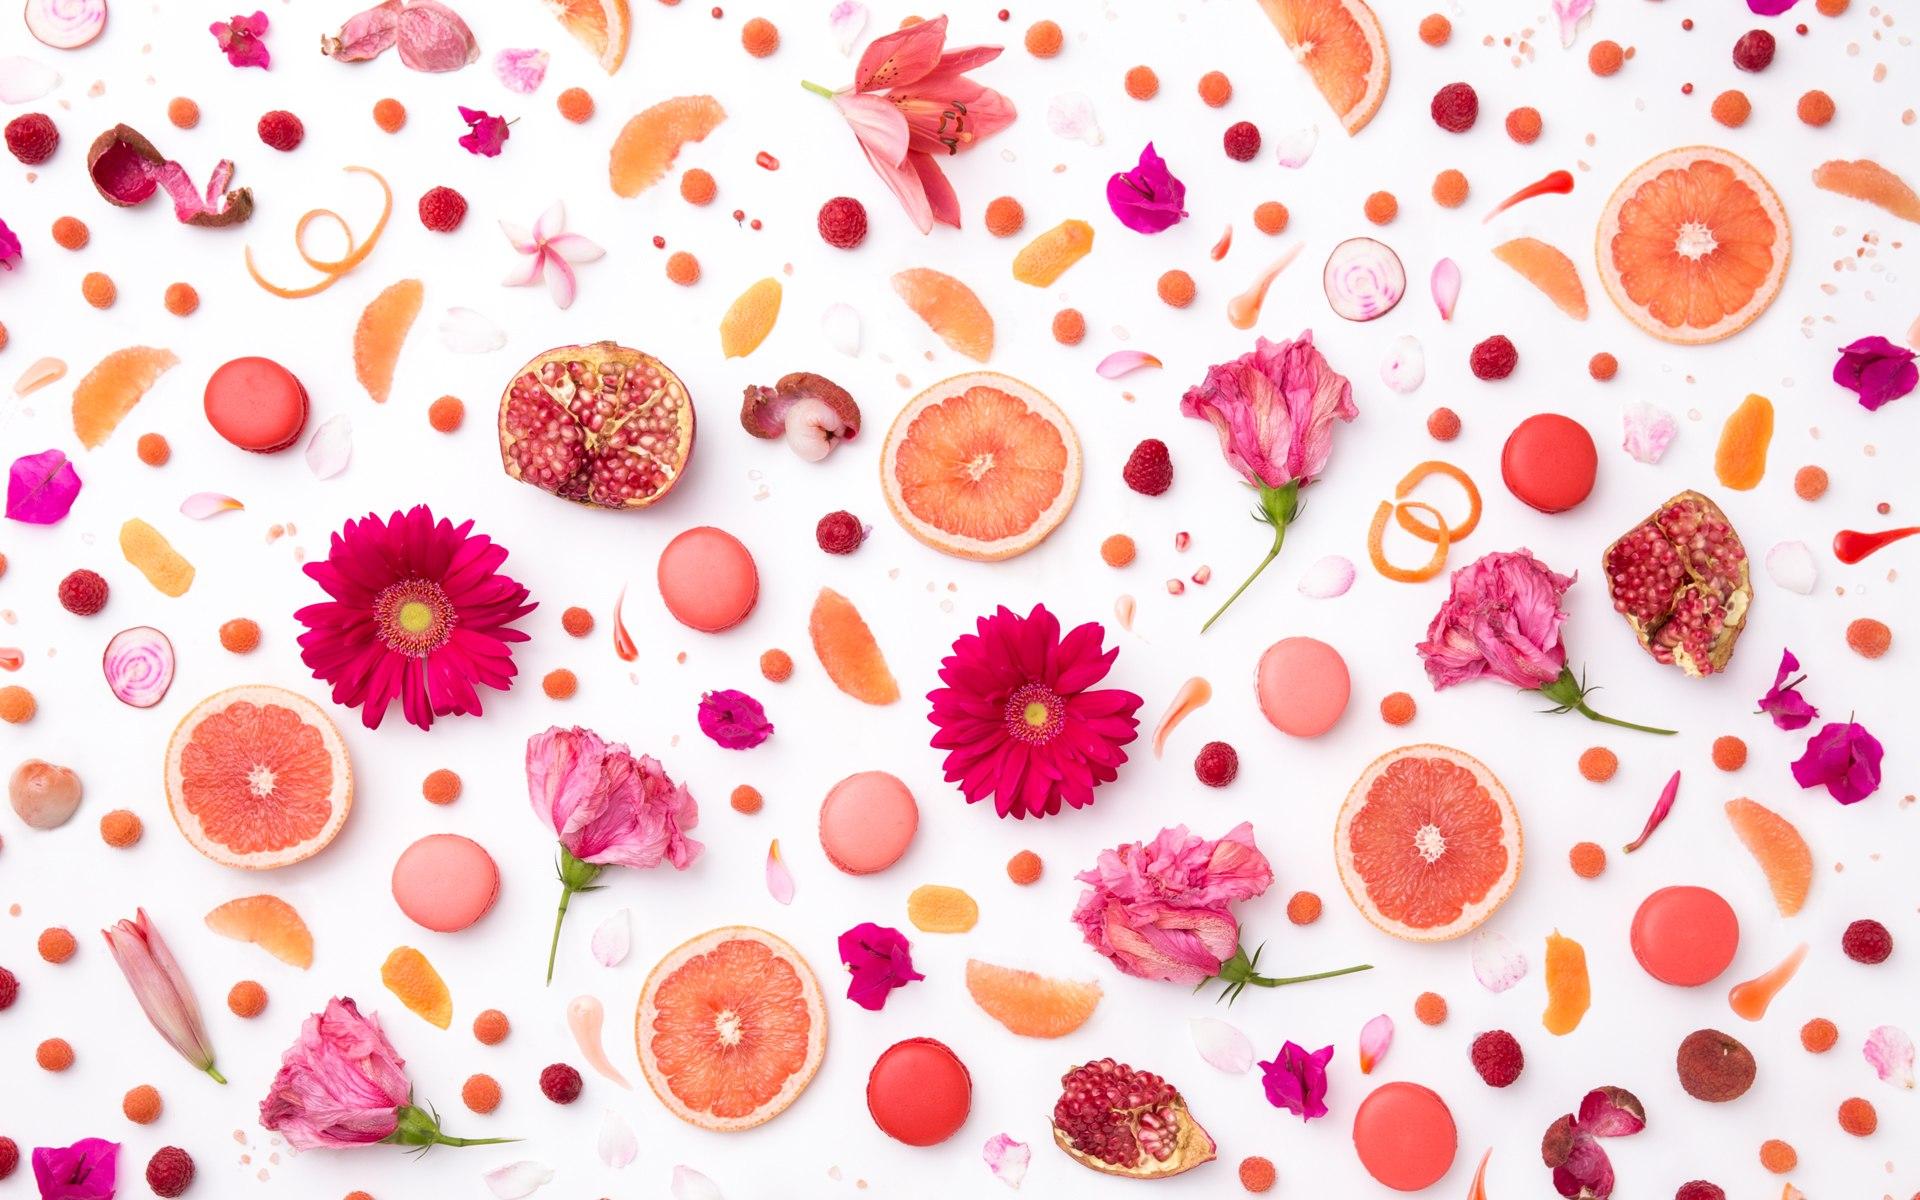 Pink Flower Hd Desktop Wallpaper - Flower Pink Hd Desktop , HD Wallpaper & Backgrounds